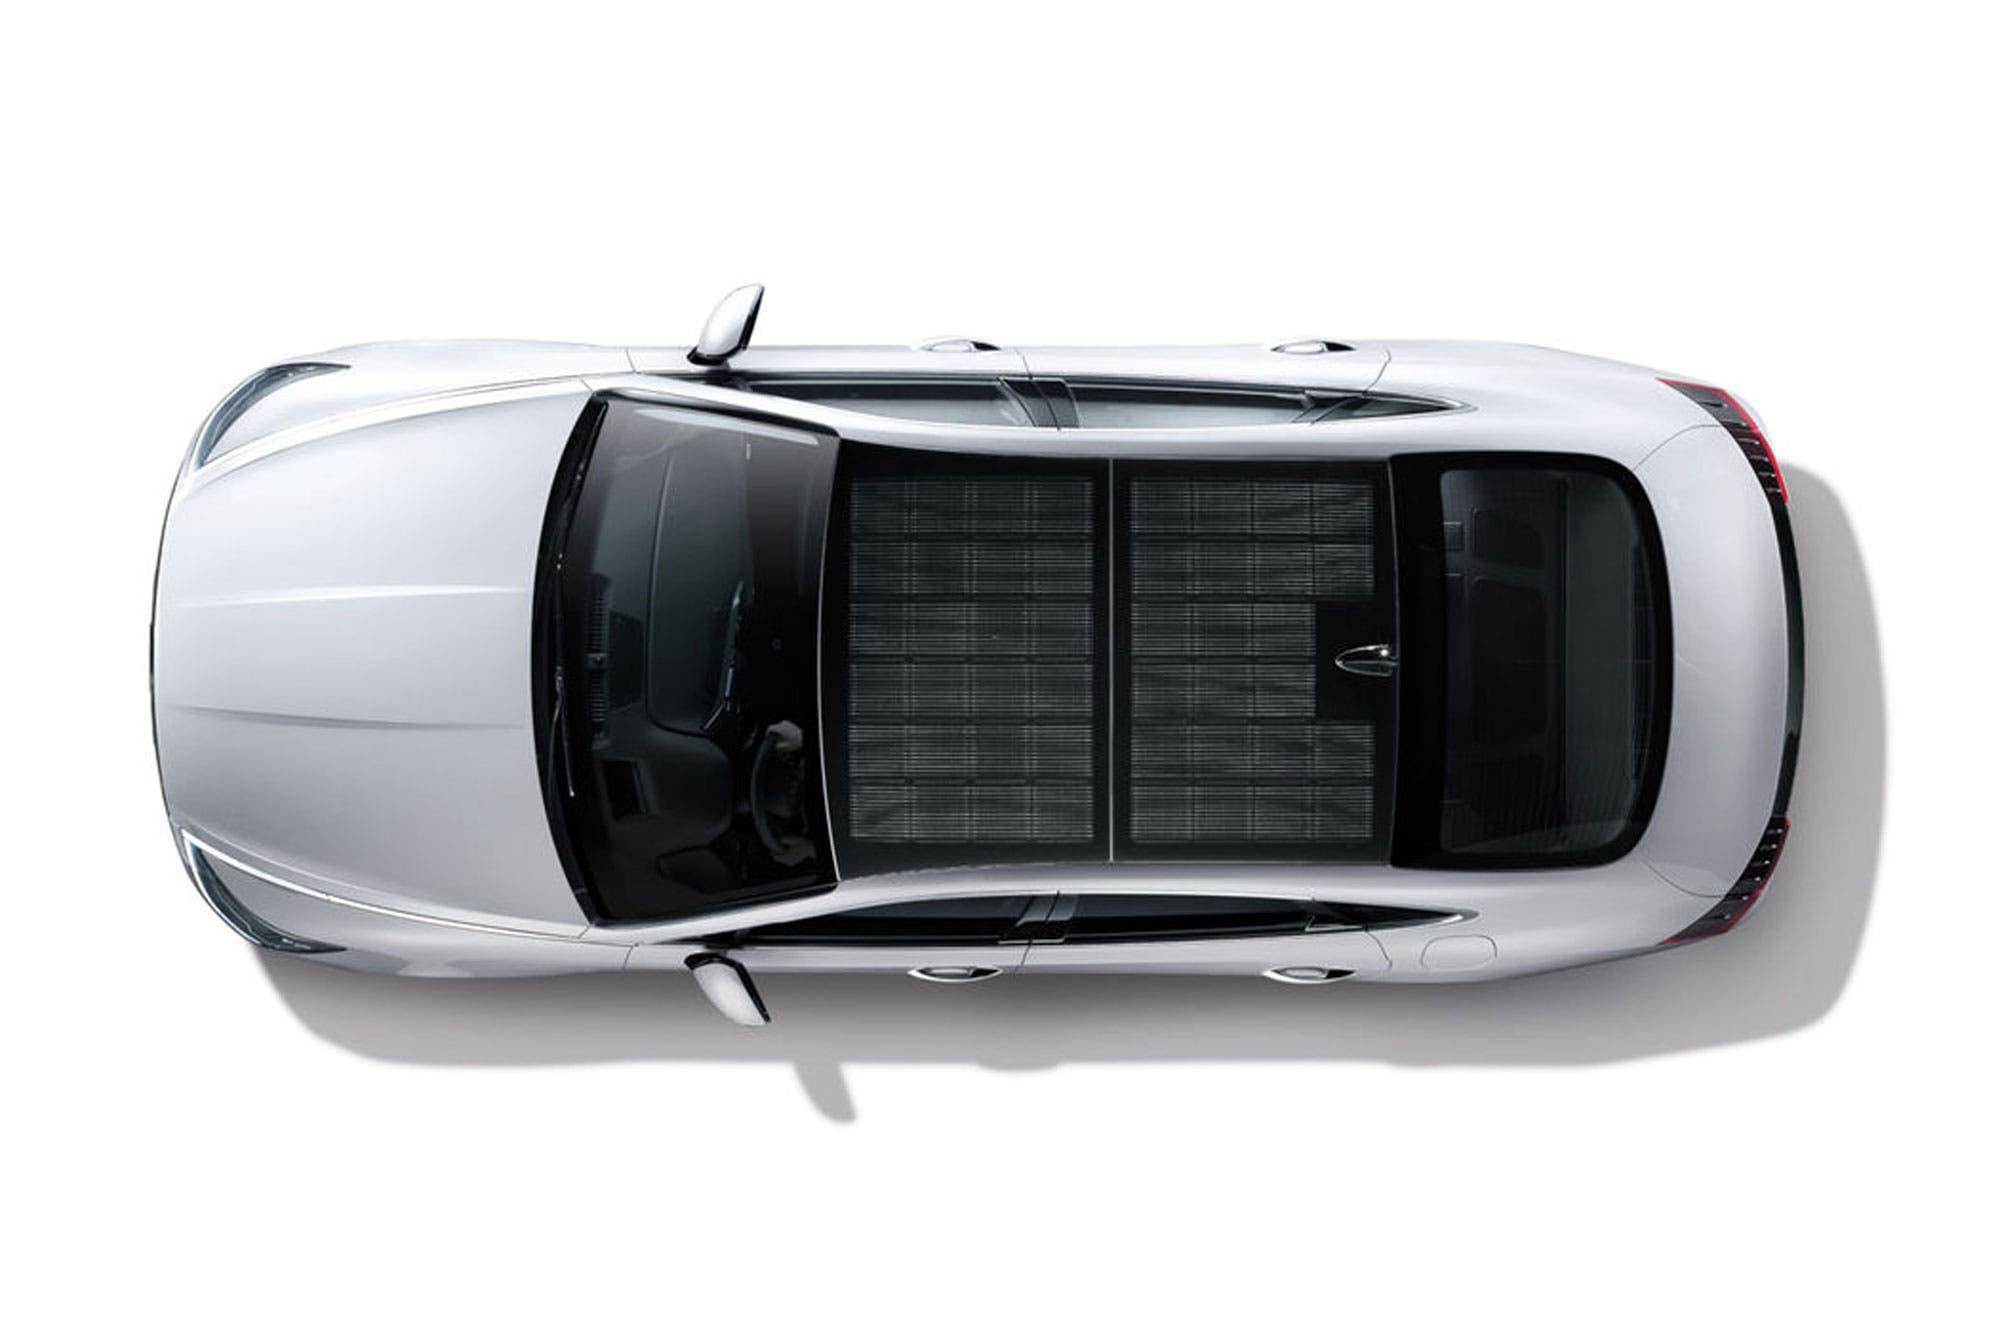 Hyundai lanza al mercado un vehículo eléctrico equipado con paneles solares